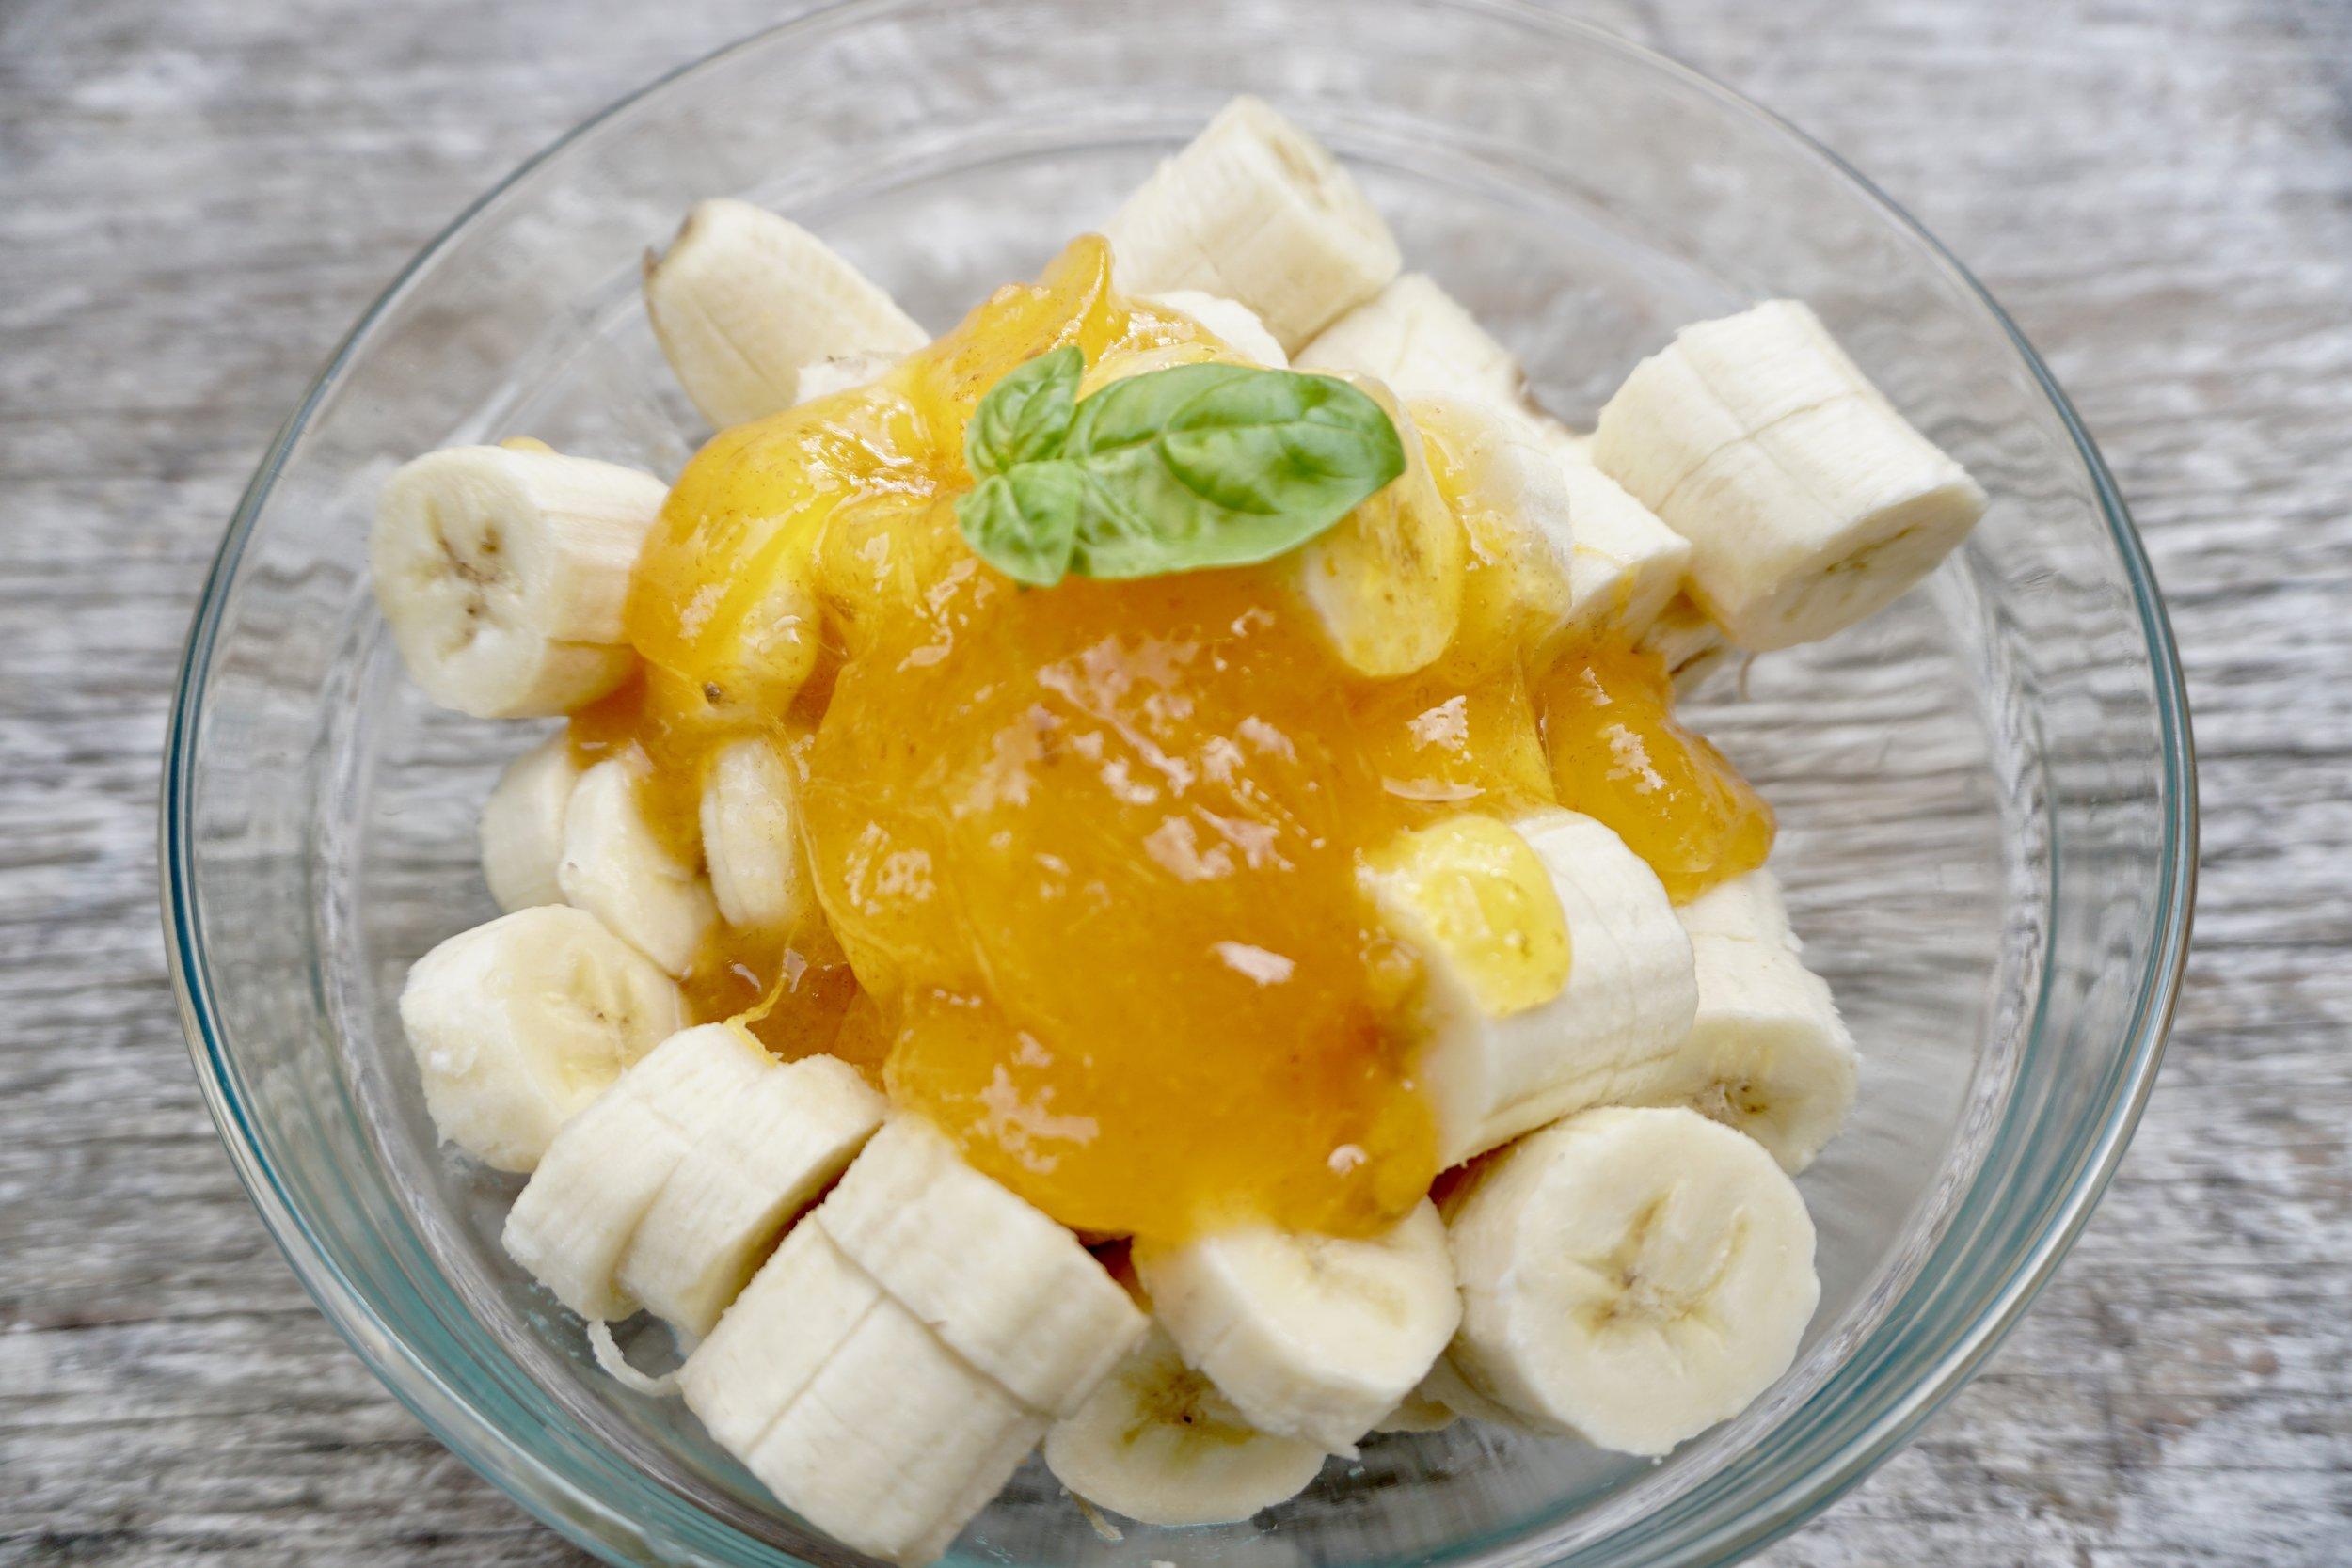 Banana with persimmon